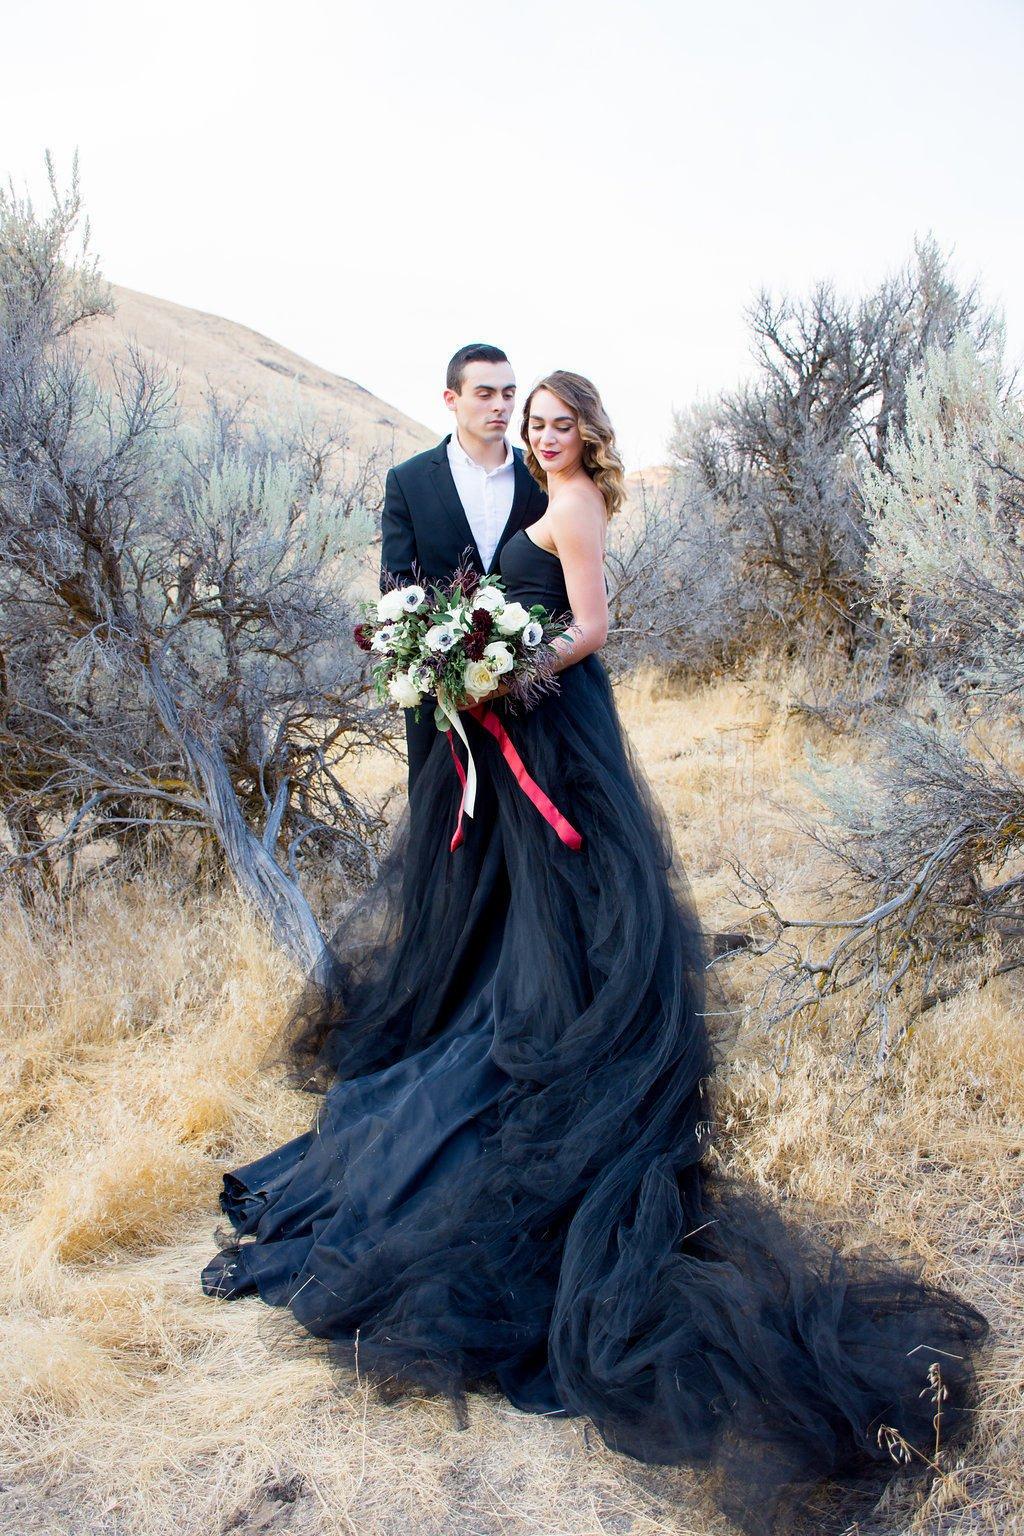 Black Wedding Dress, Tulle Skirt, Gothic, Goth, Colored Wedding Dress, Alternative TWILIGHT, Black,.jpg